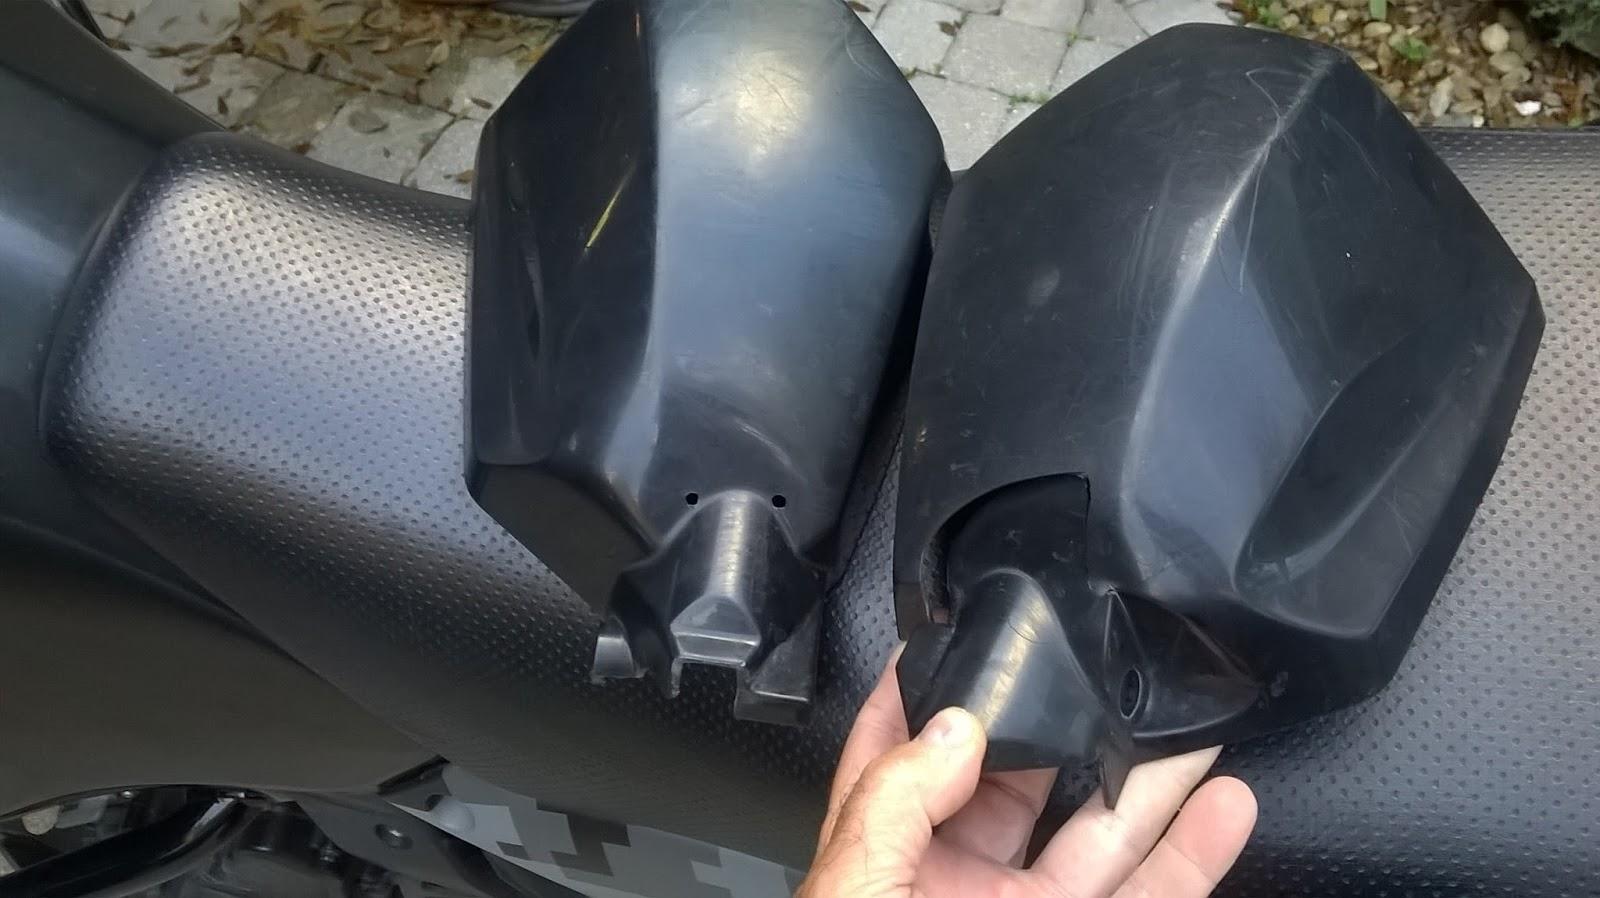 KamoKLR: Trackside Aluminum Handguards